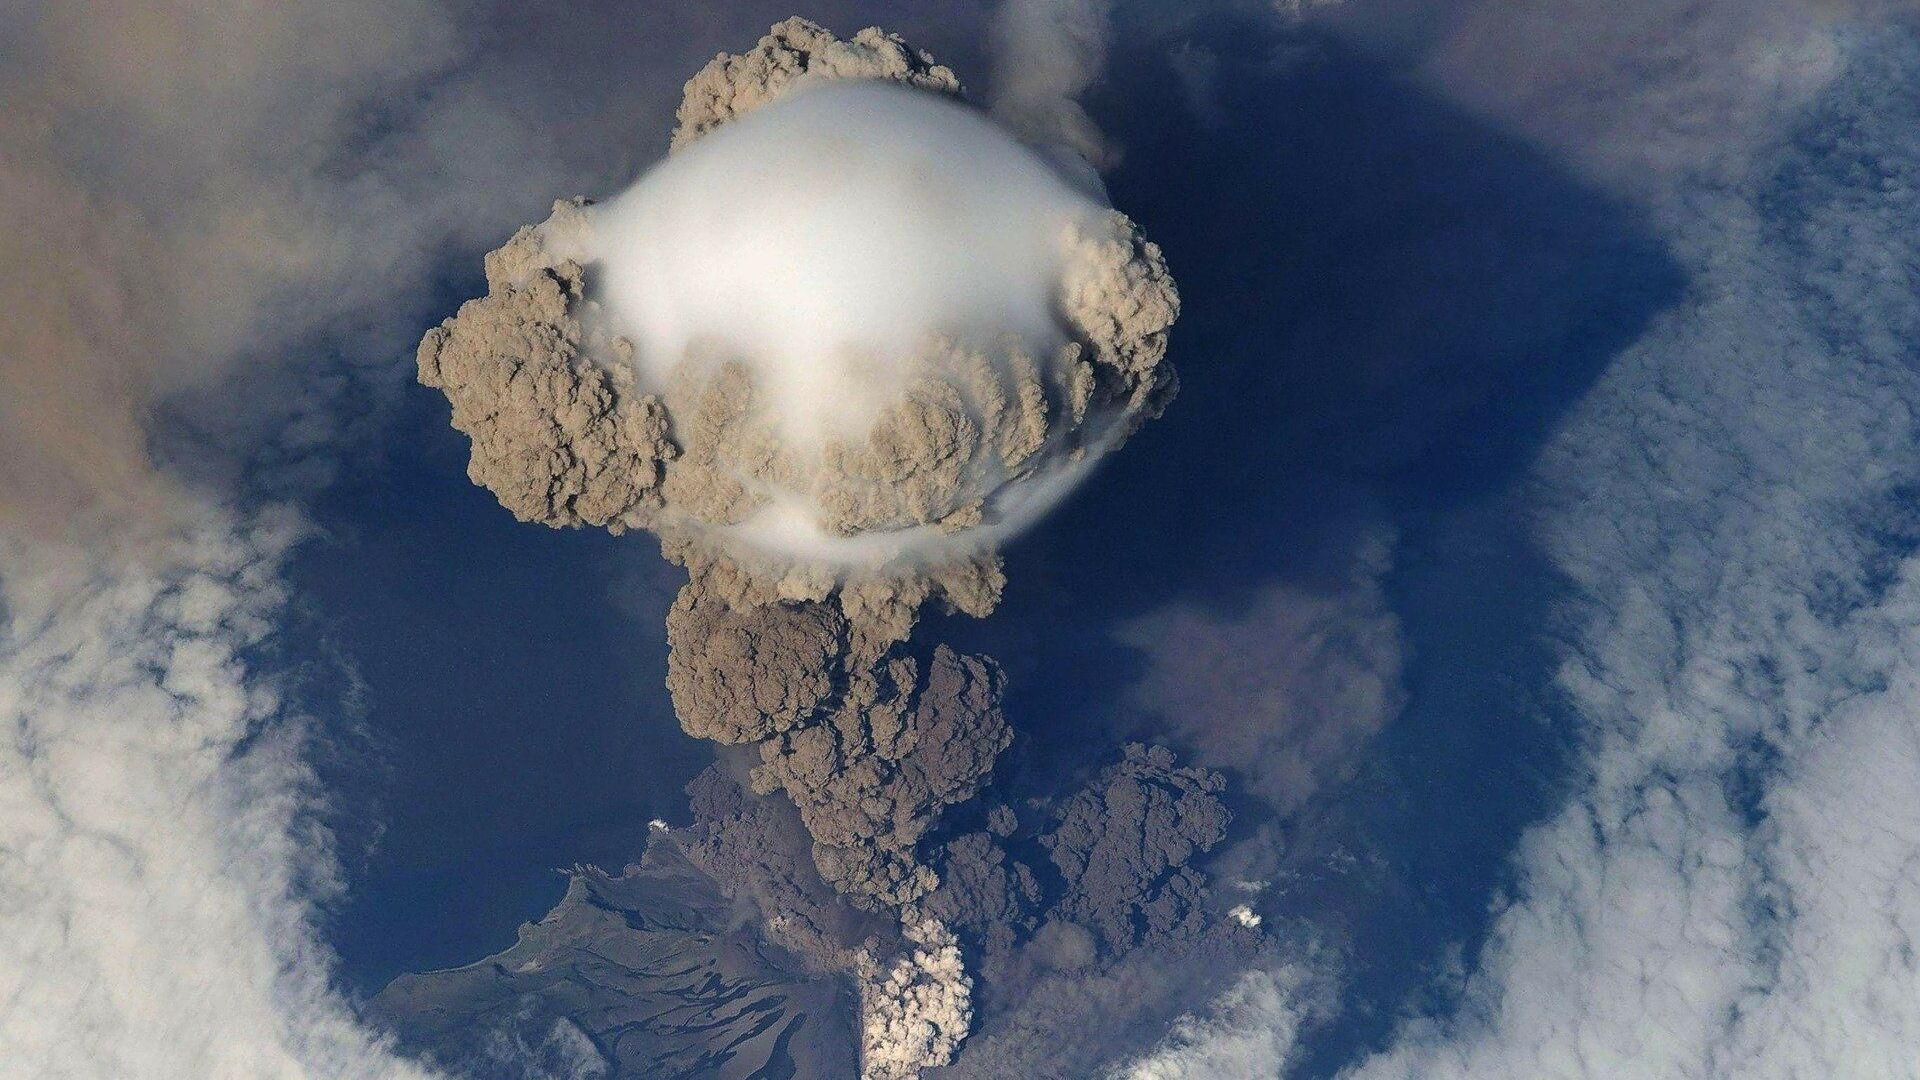 Erupción de un volcán (imagen referencial) - Sputnik Mundo, 1920, 14.05.2021